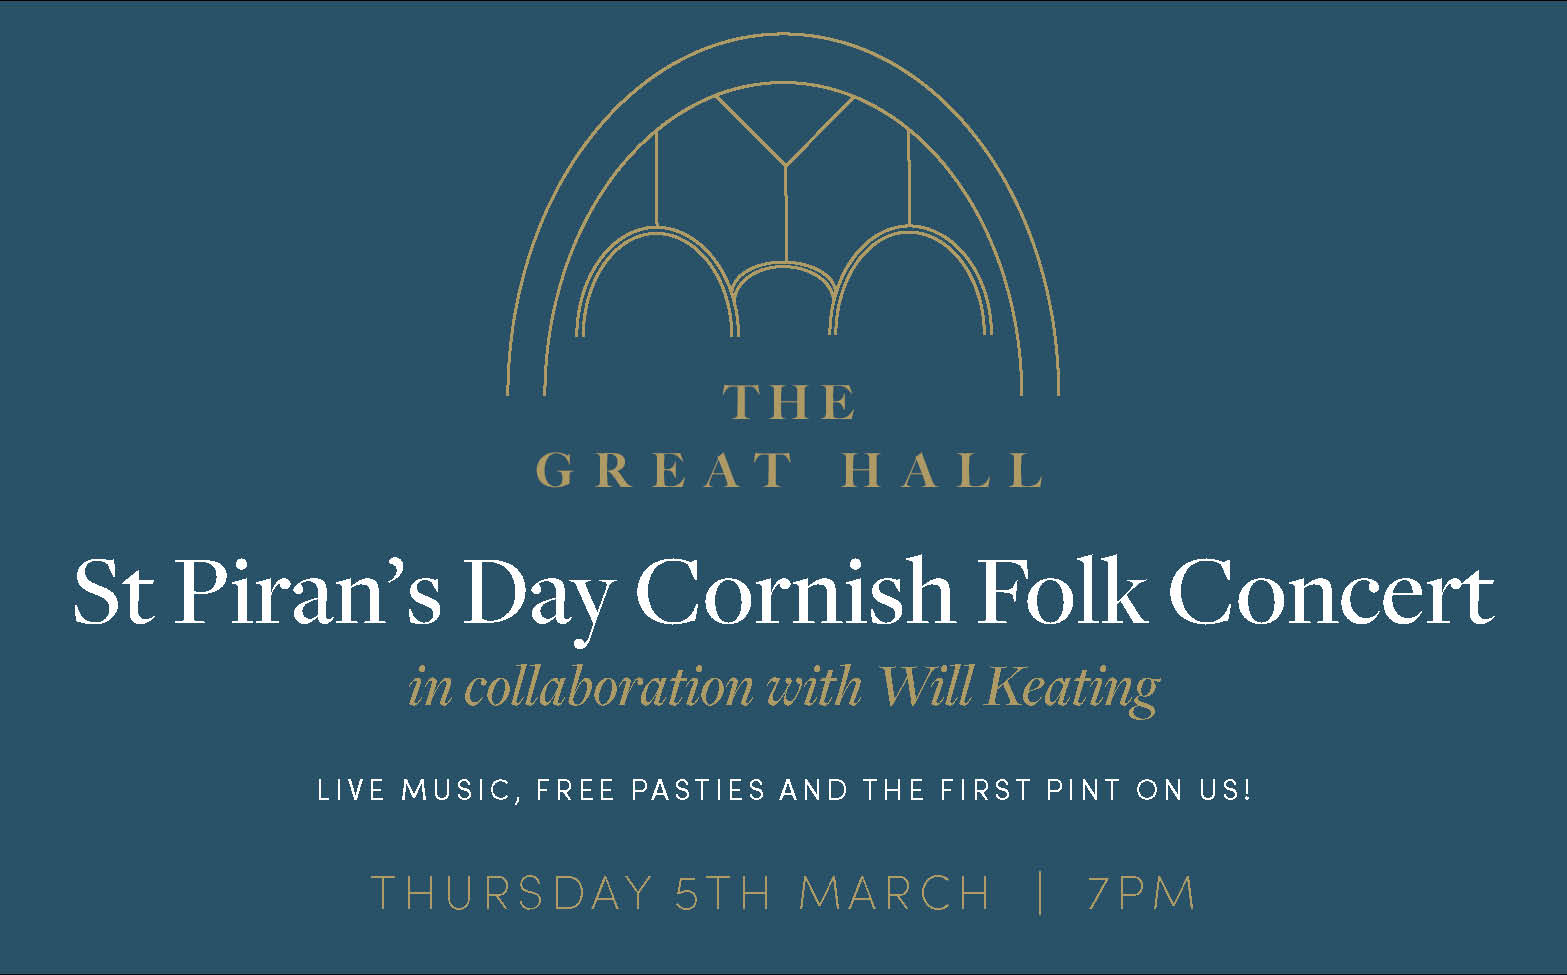 St Piran's Day Cornish Folk Festival